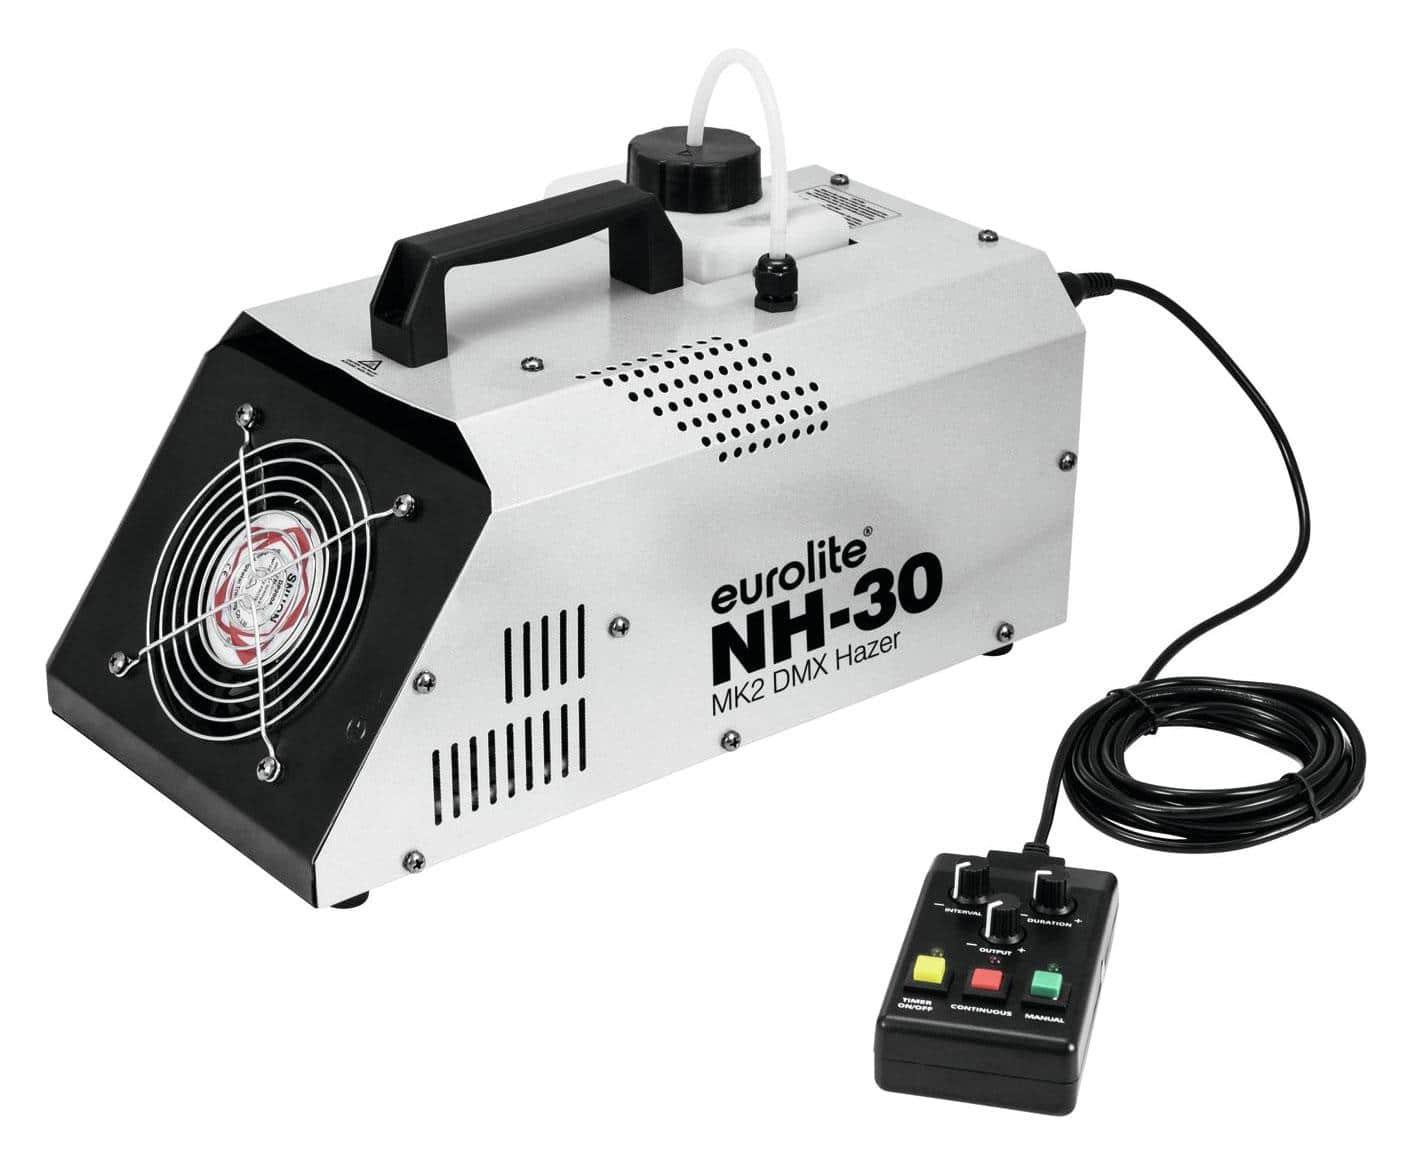 Eurolite NH 30 MK2 DMX Dunstnebelmaschine